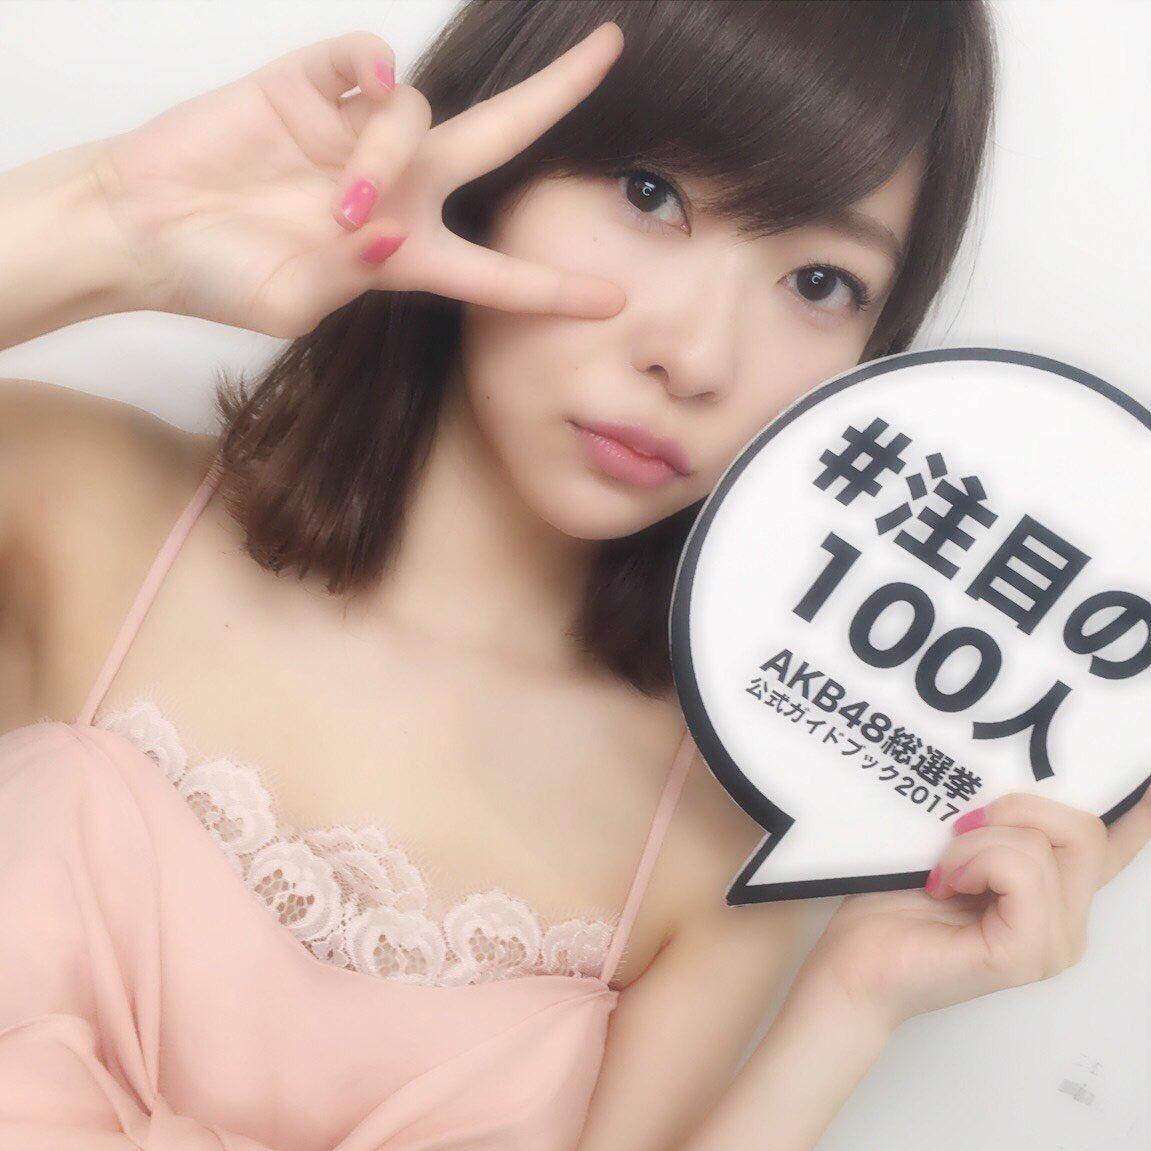 "【AKB48】「AKB48総選挙ガイド」順位予想発表 8位大家志津香、6位""フレッシュレモン""市川美織 1位は… [無断転載禁止]©2ch.netYouTube動画>2本 ->画像>149枚"